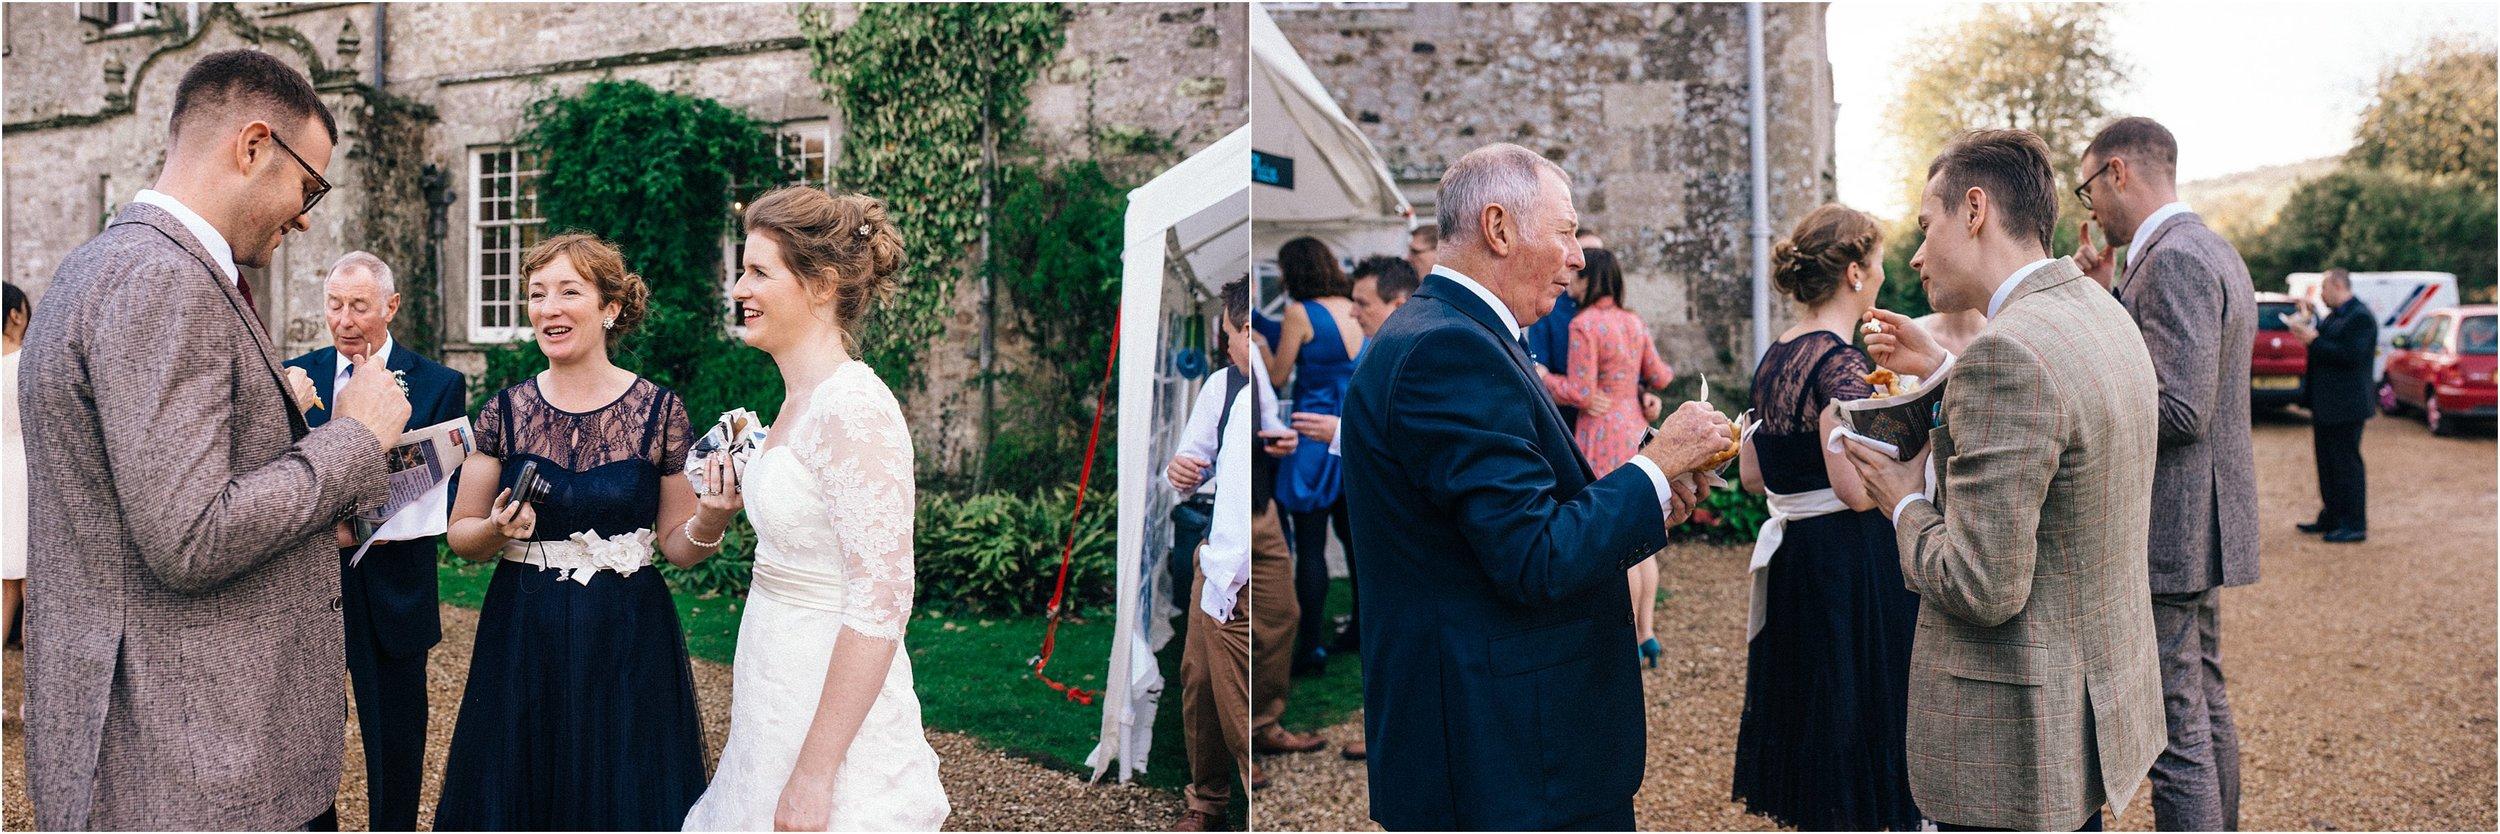 Northcourt House Wedding_0046.jpg